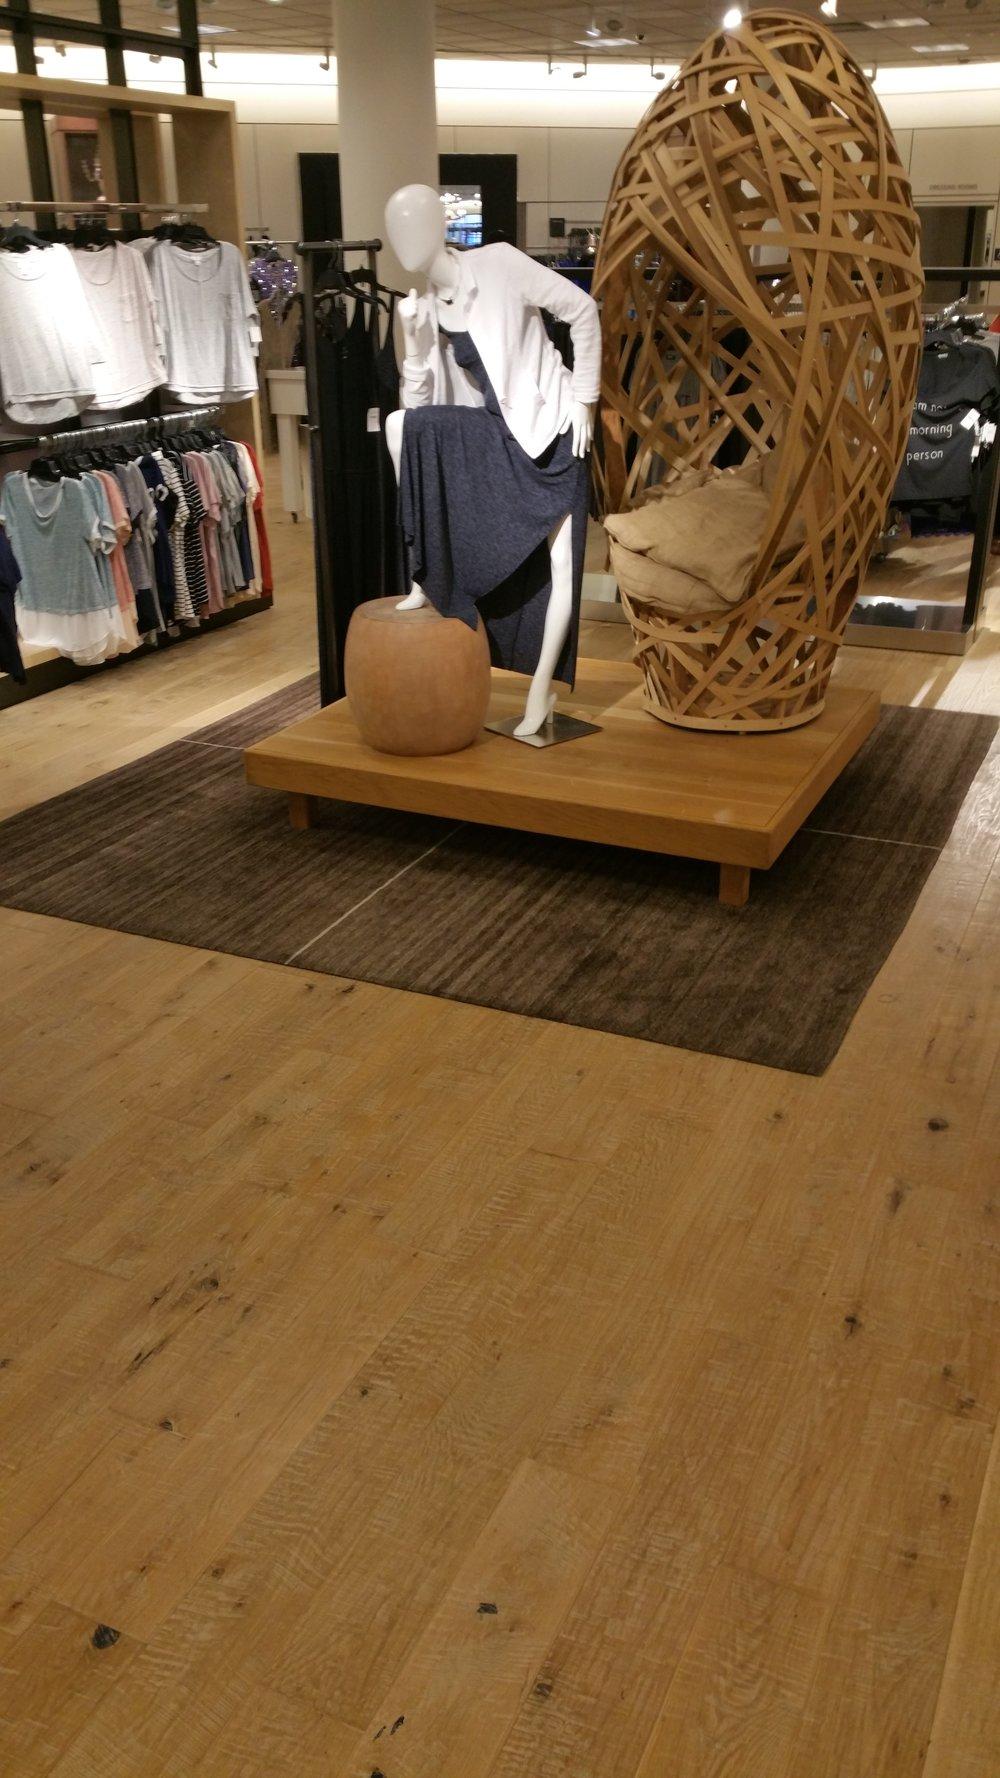 Major Retail-0024.jpg